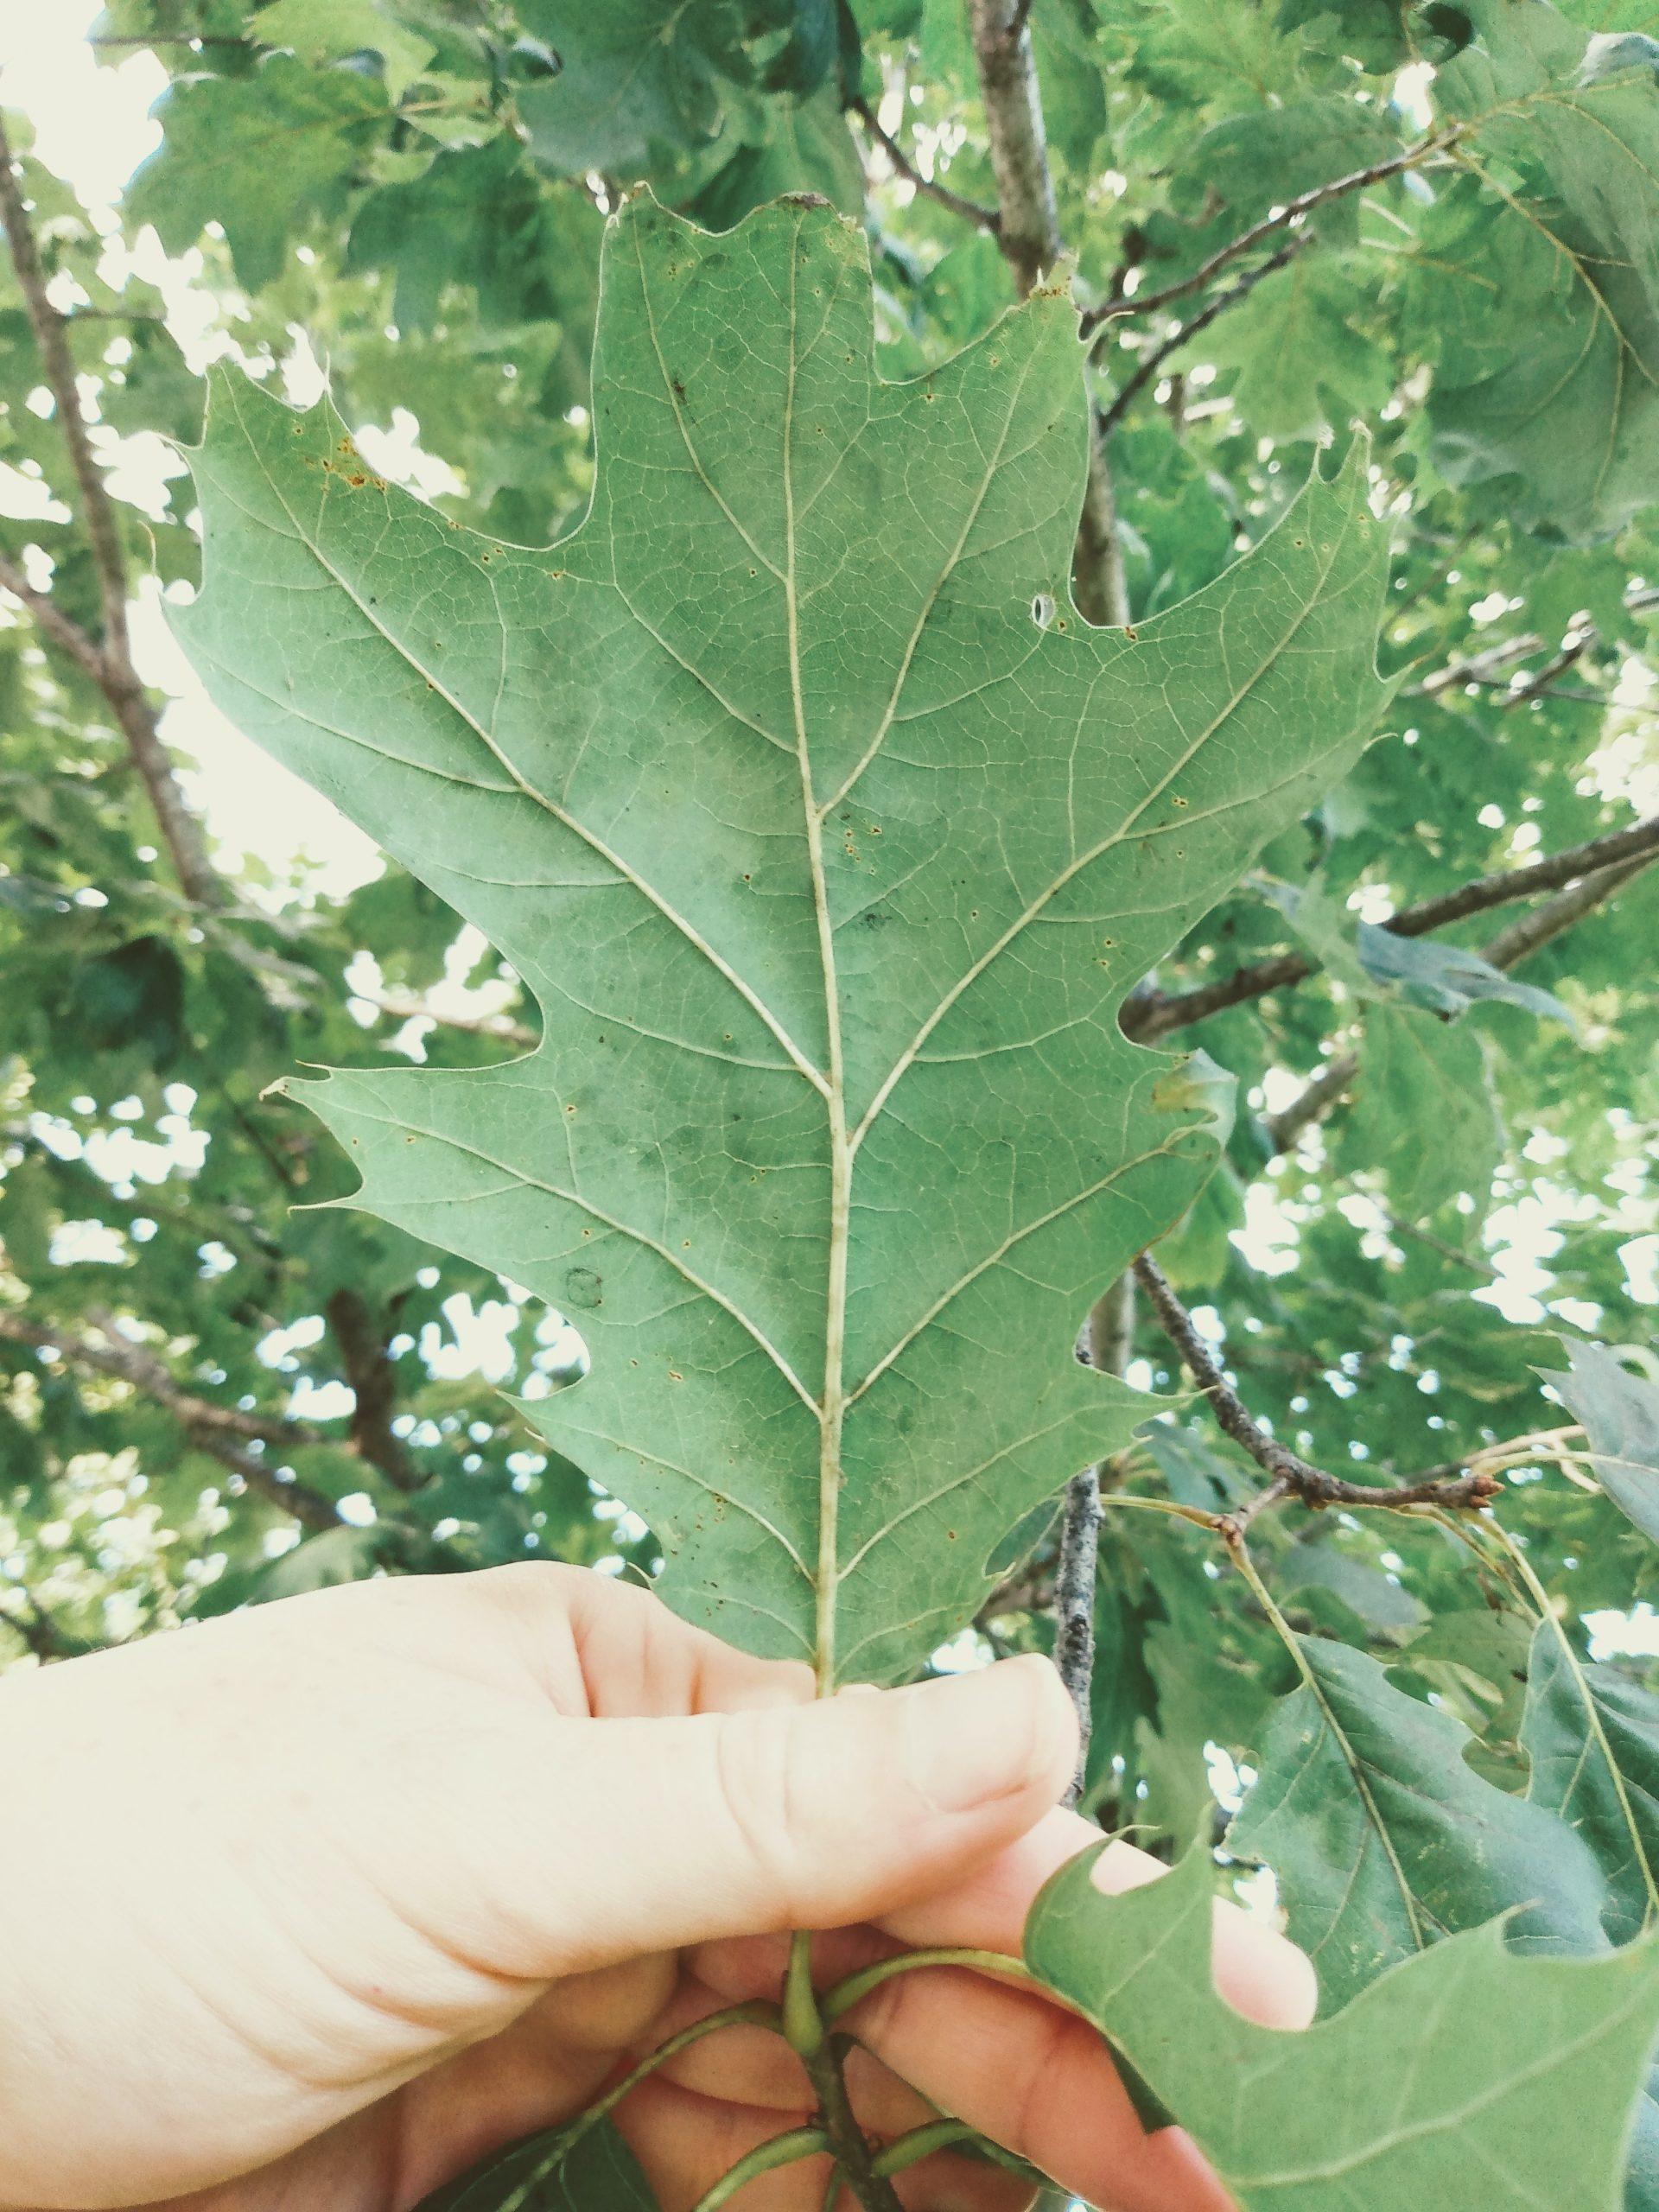 Oak Leaf Veins